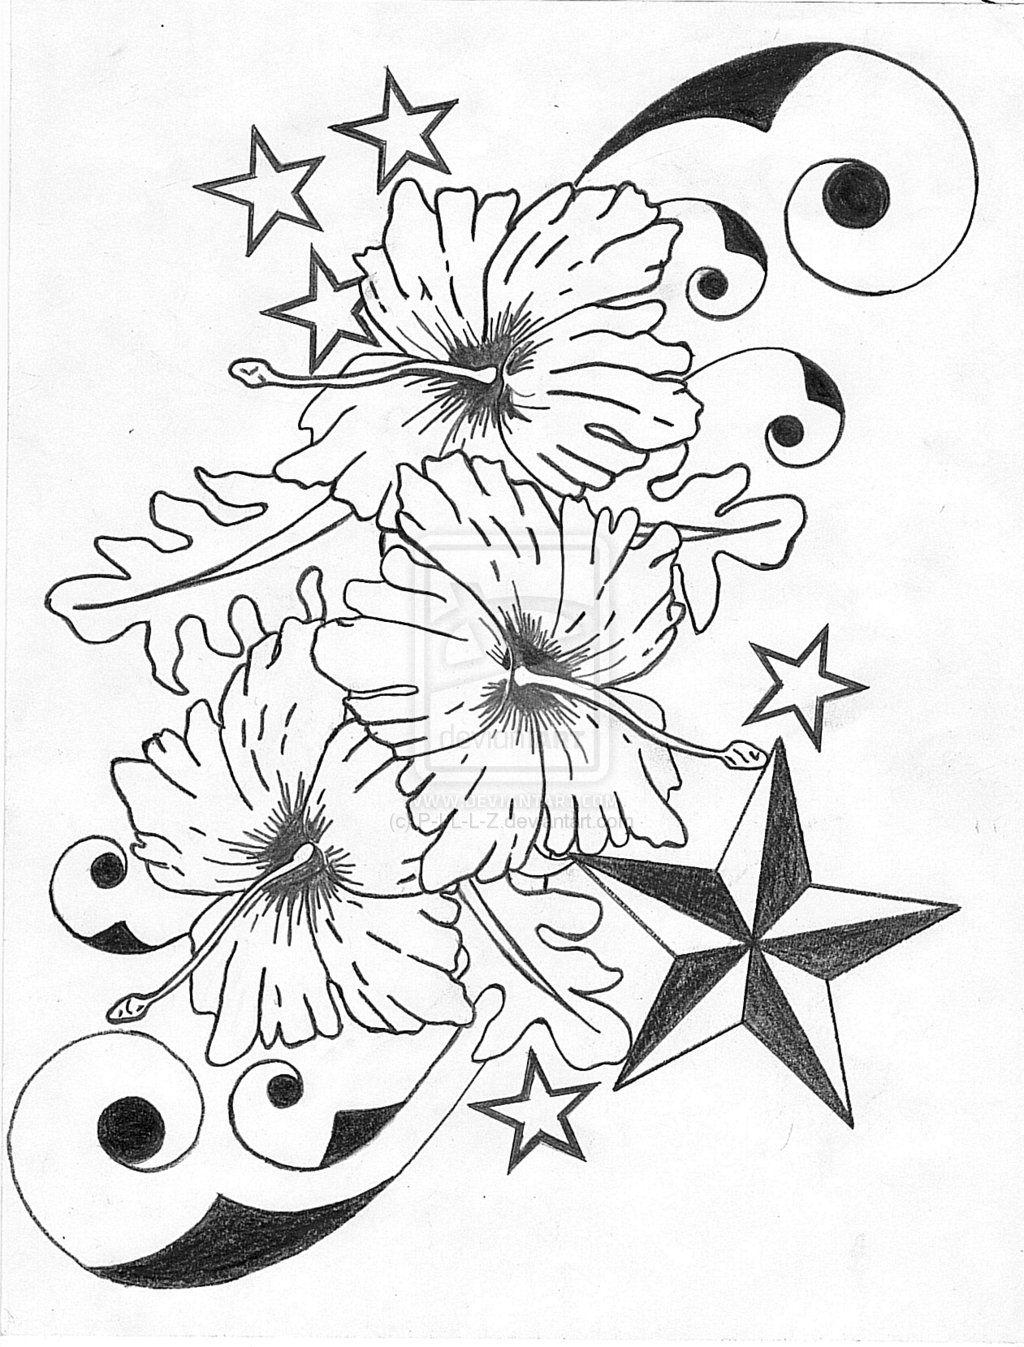 Hibiscus Flower Tattoo Stencil: Hibiscus-flower-n-nautical-star-tattoo-designs.jpg (1024